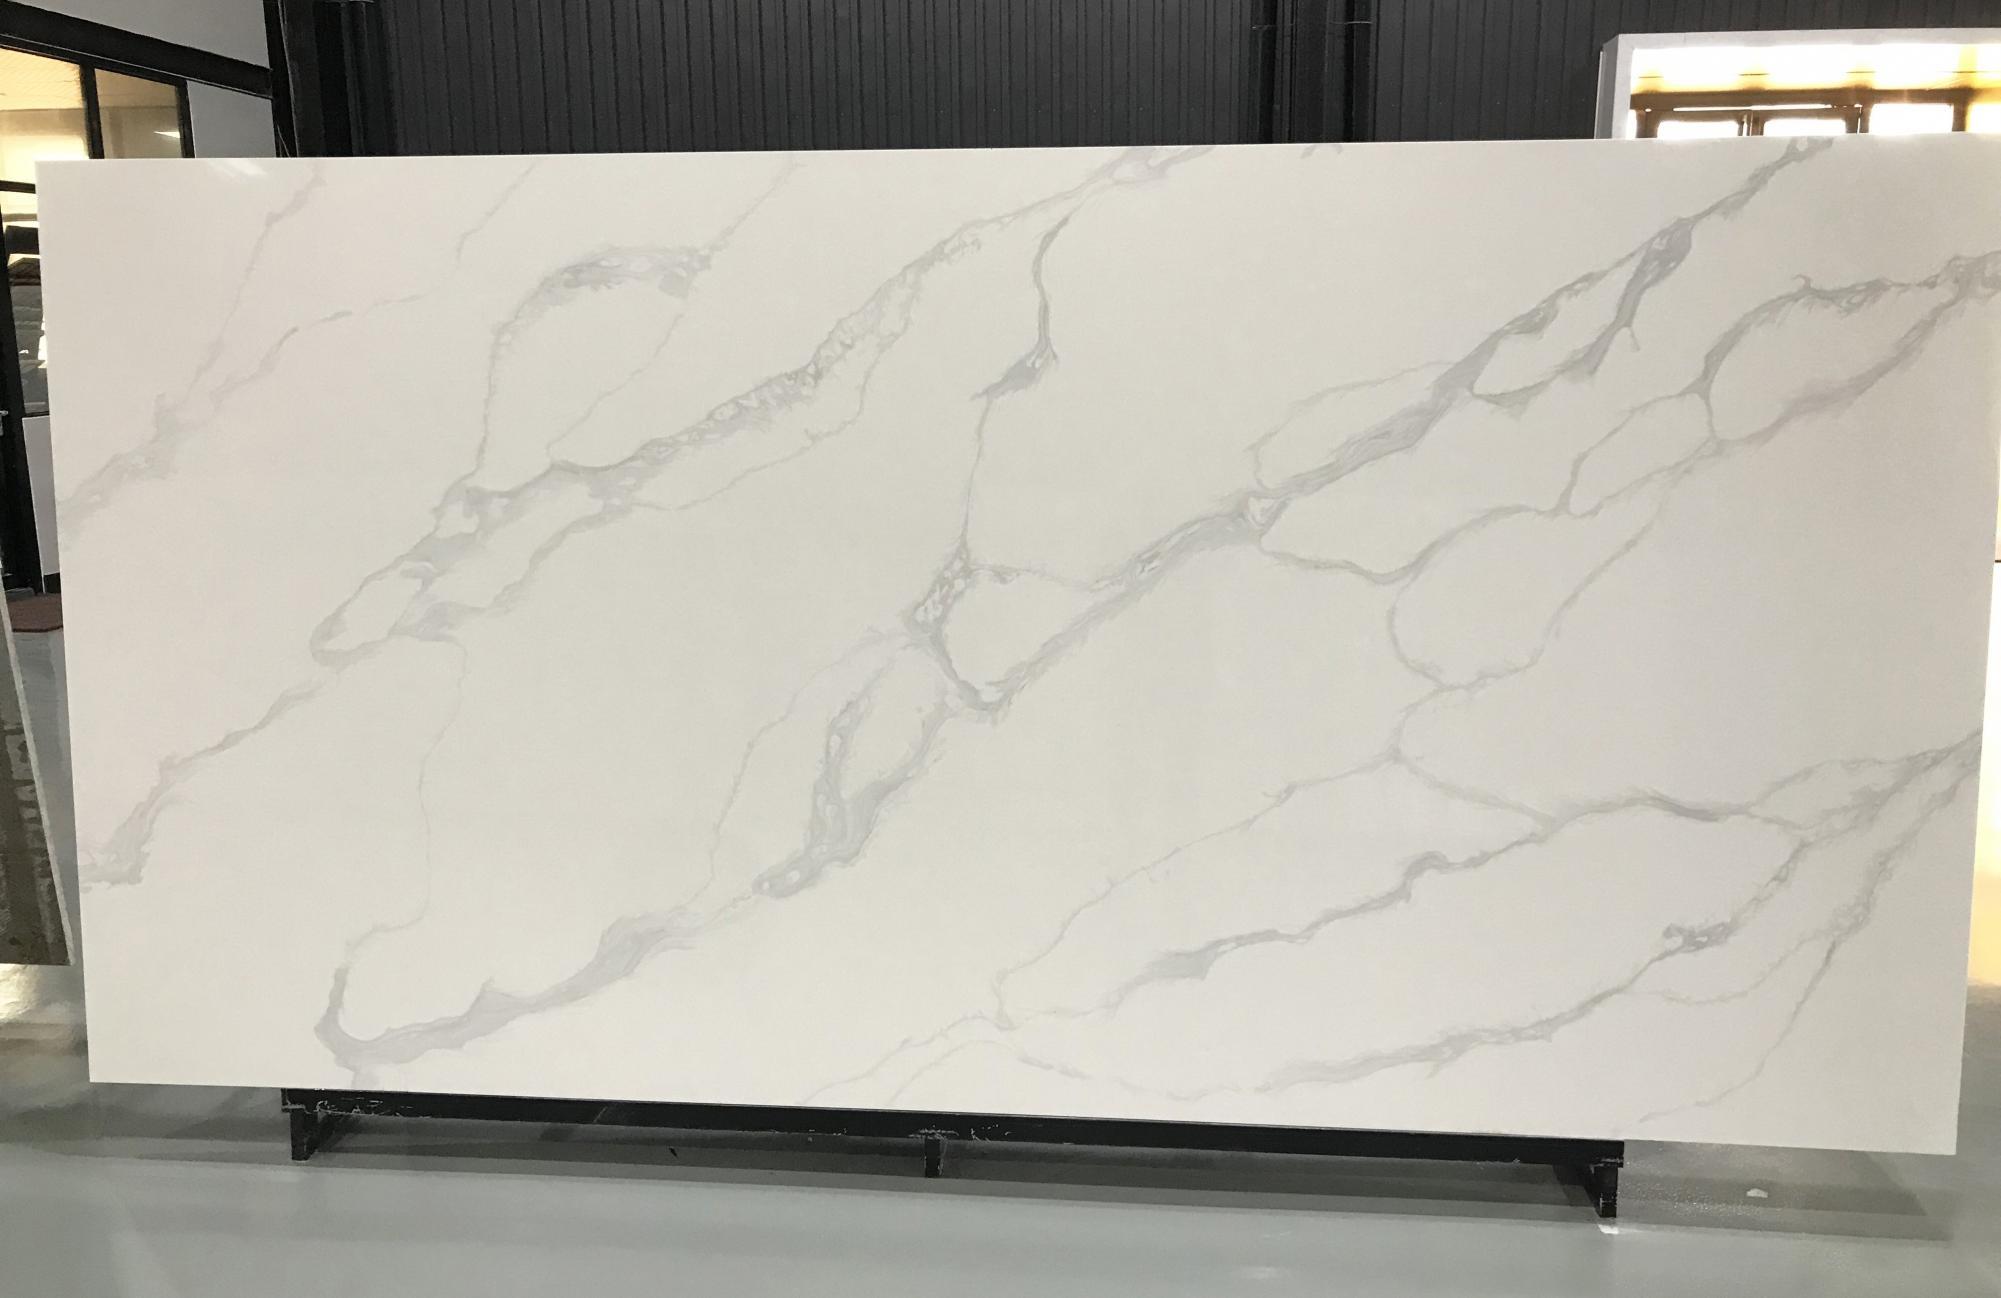 MARINA Supply Hai Phong (Vietnam) polished slabs EGA6012 , SL3CM artificial aglo quartz